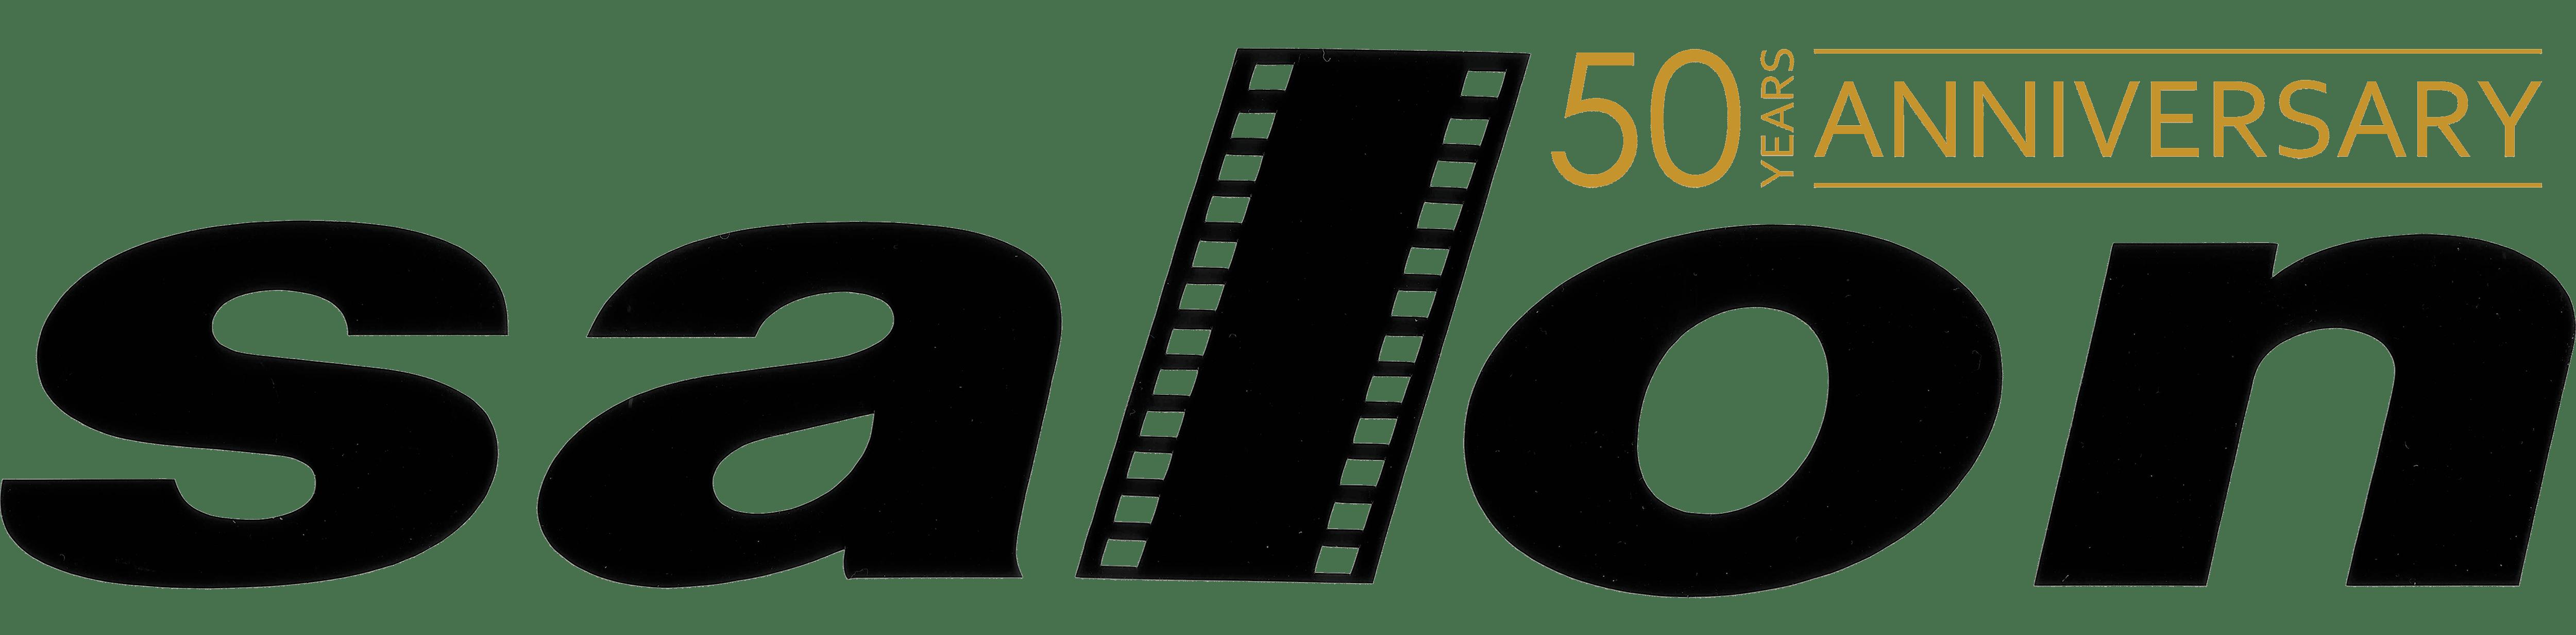 Salon logo 50th